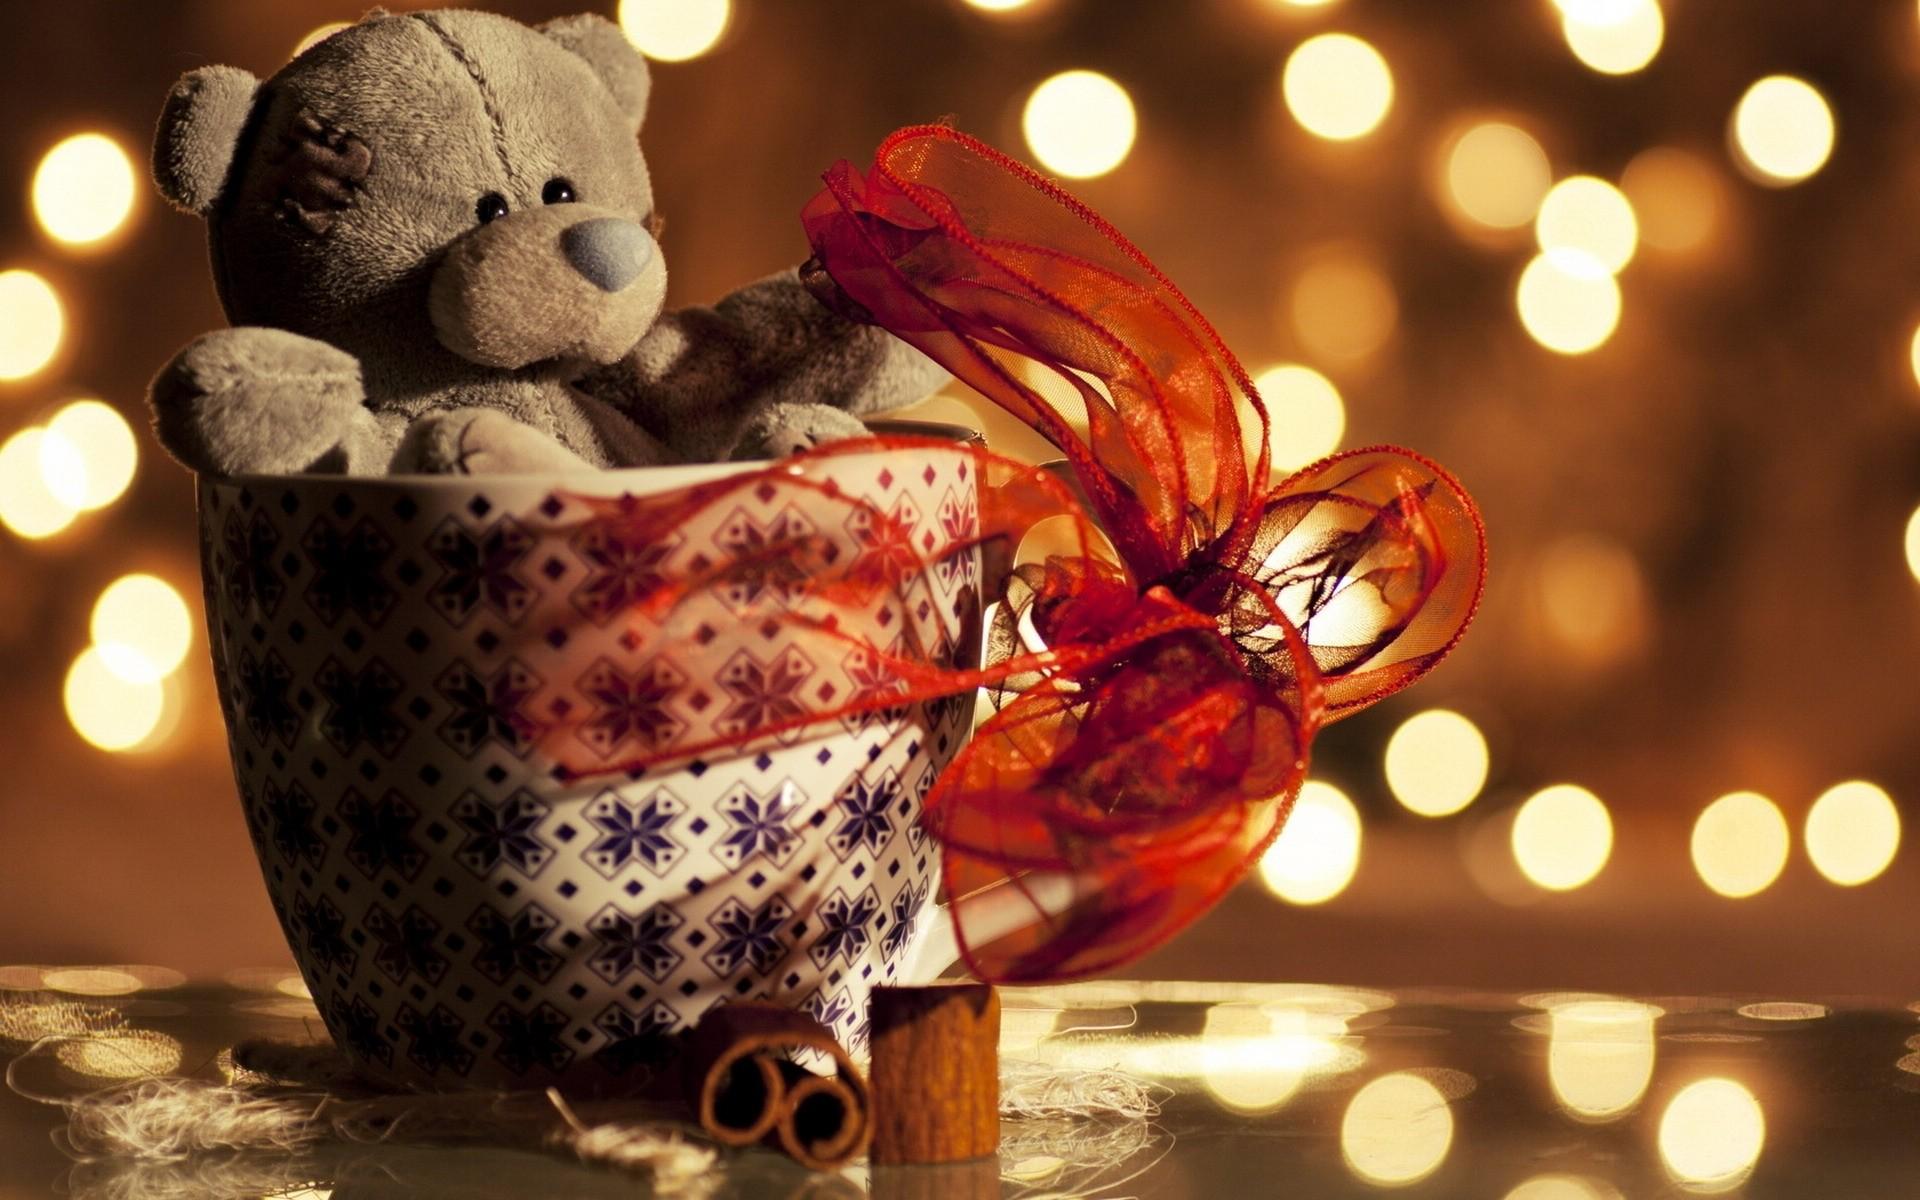 Cute Teddy Bear Gift HD Wallpaper of Love   hdwallpaper2013com 1920x1200